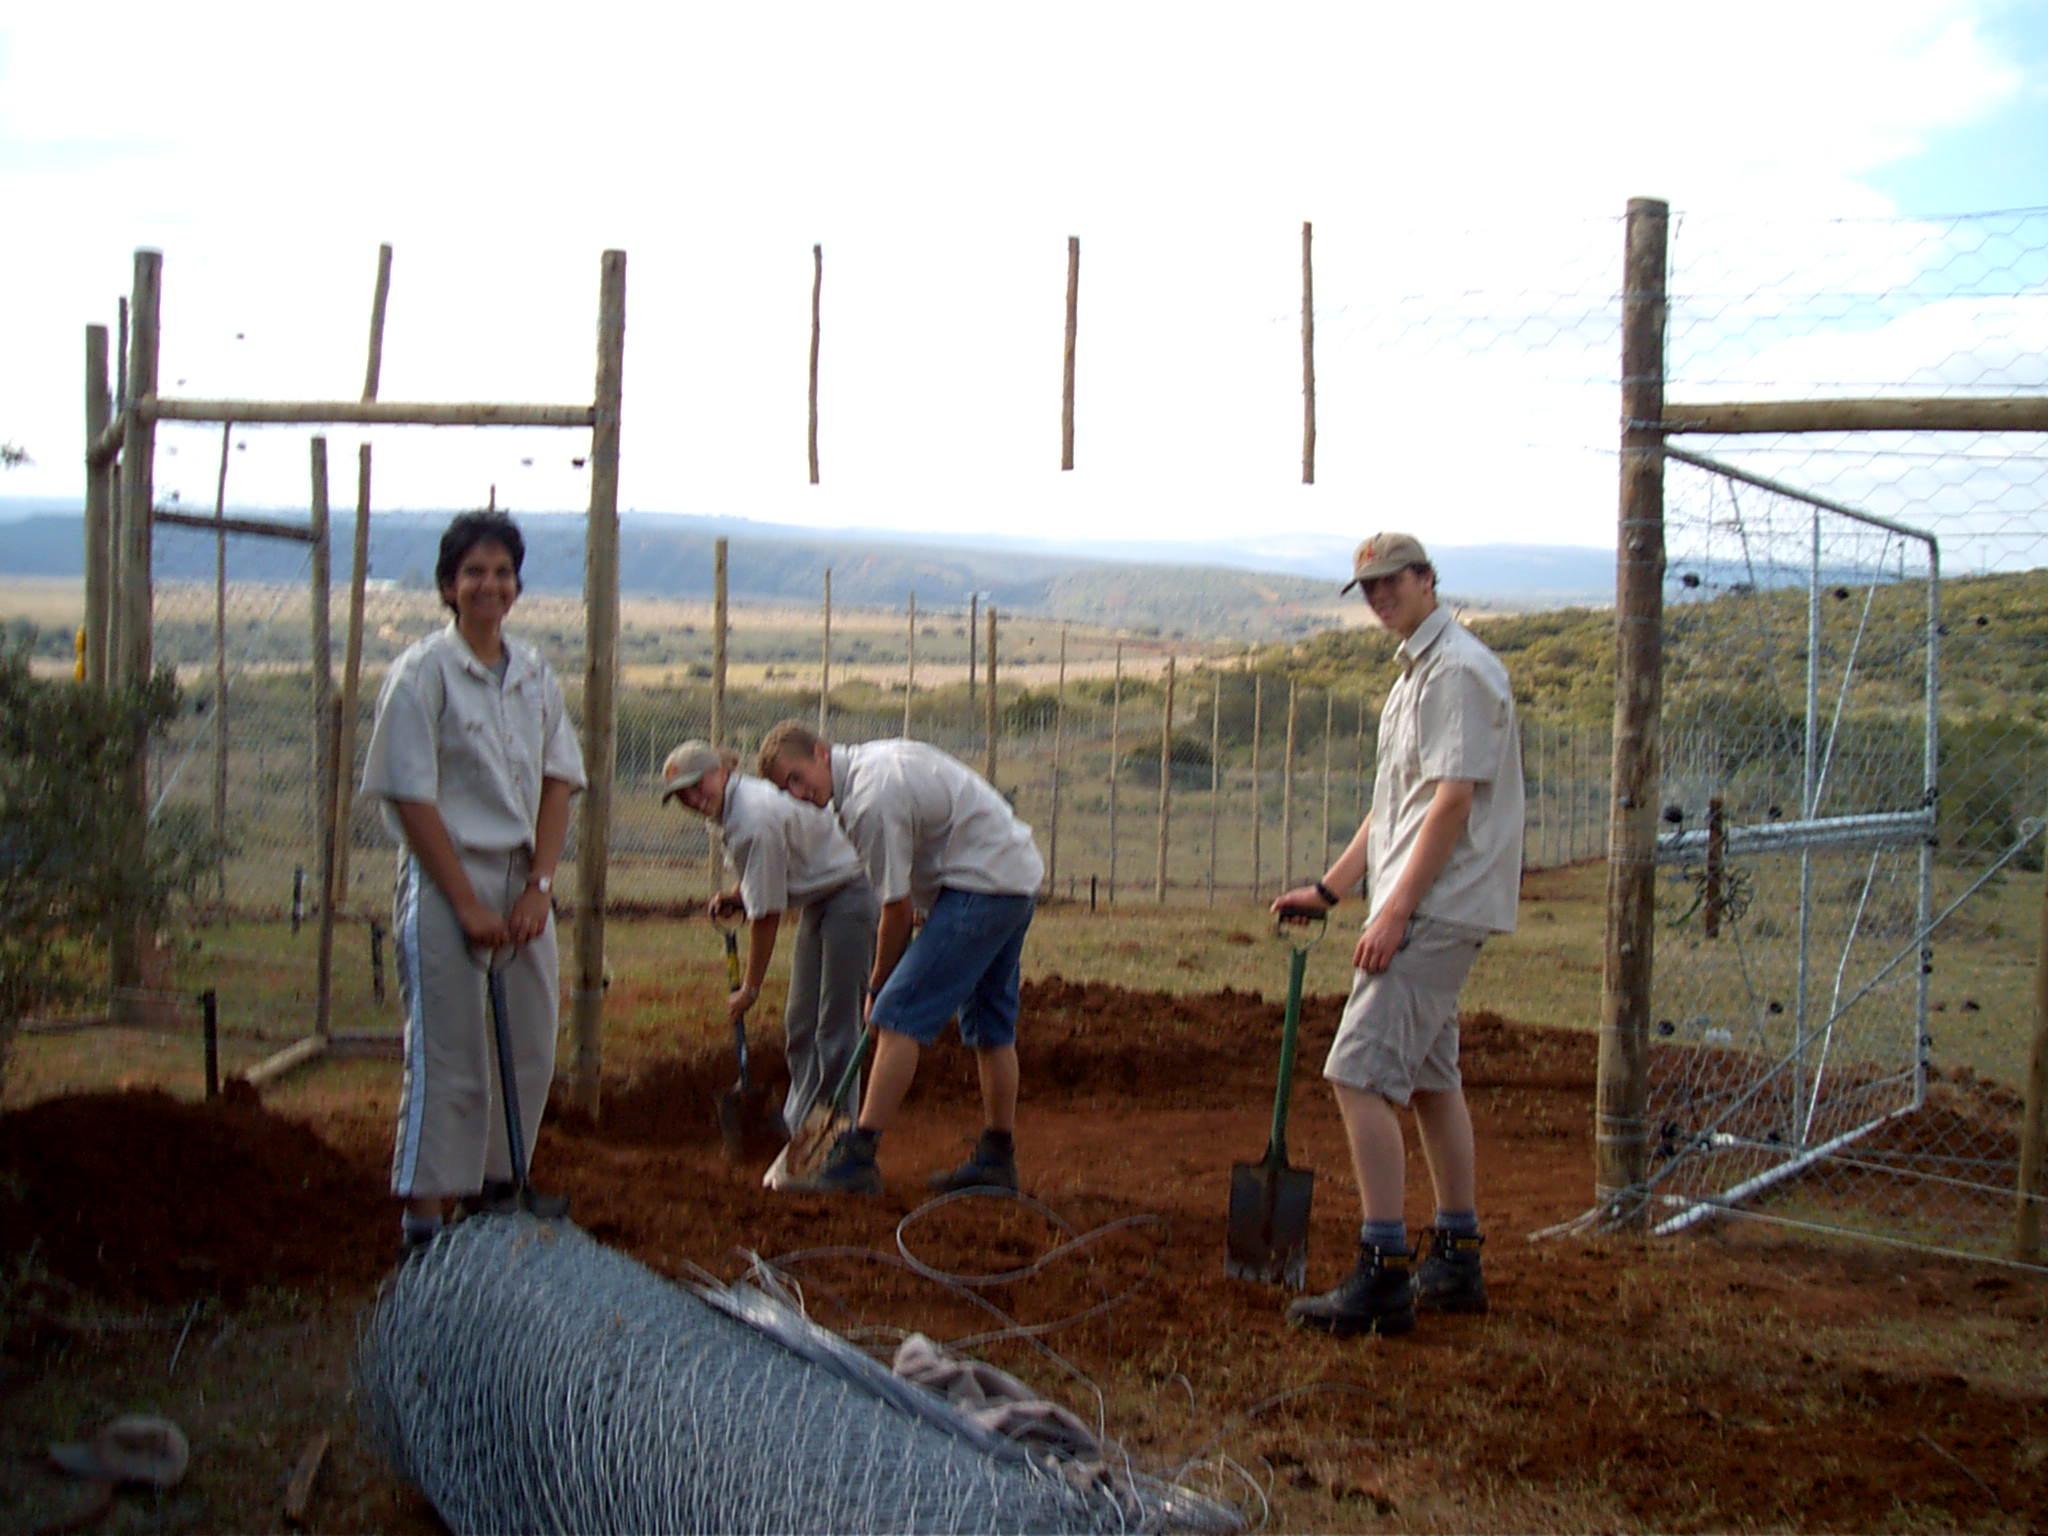 volunteers working hard, digging a boma for the hoedspruit endangered species centre